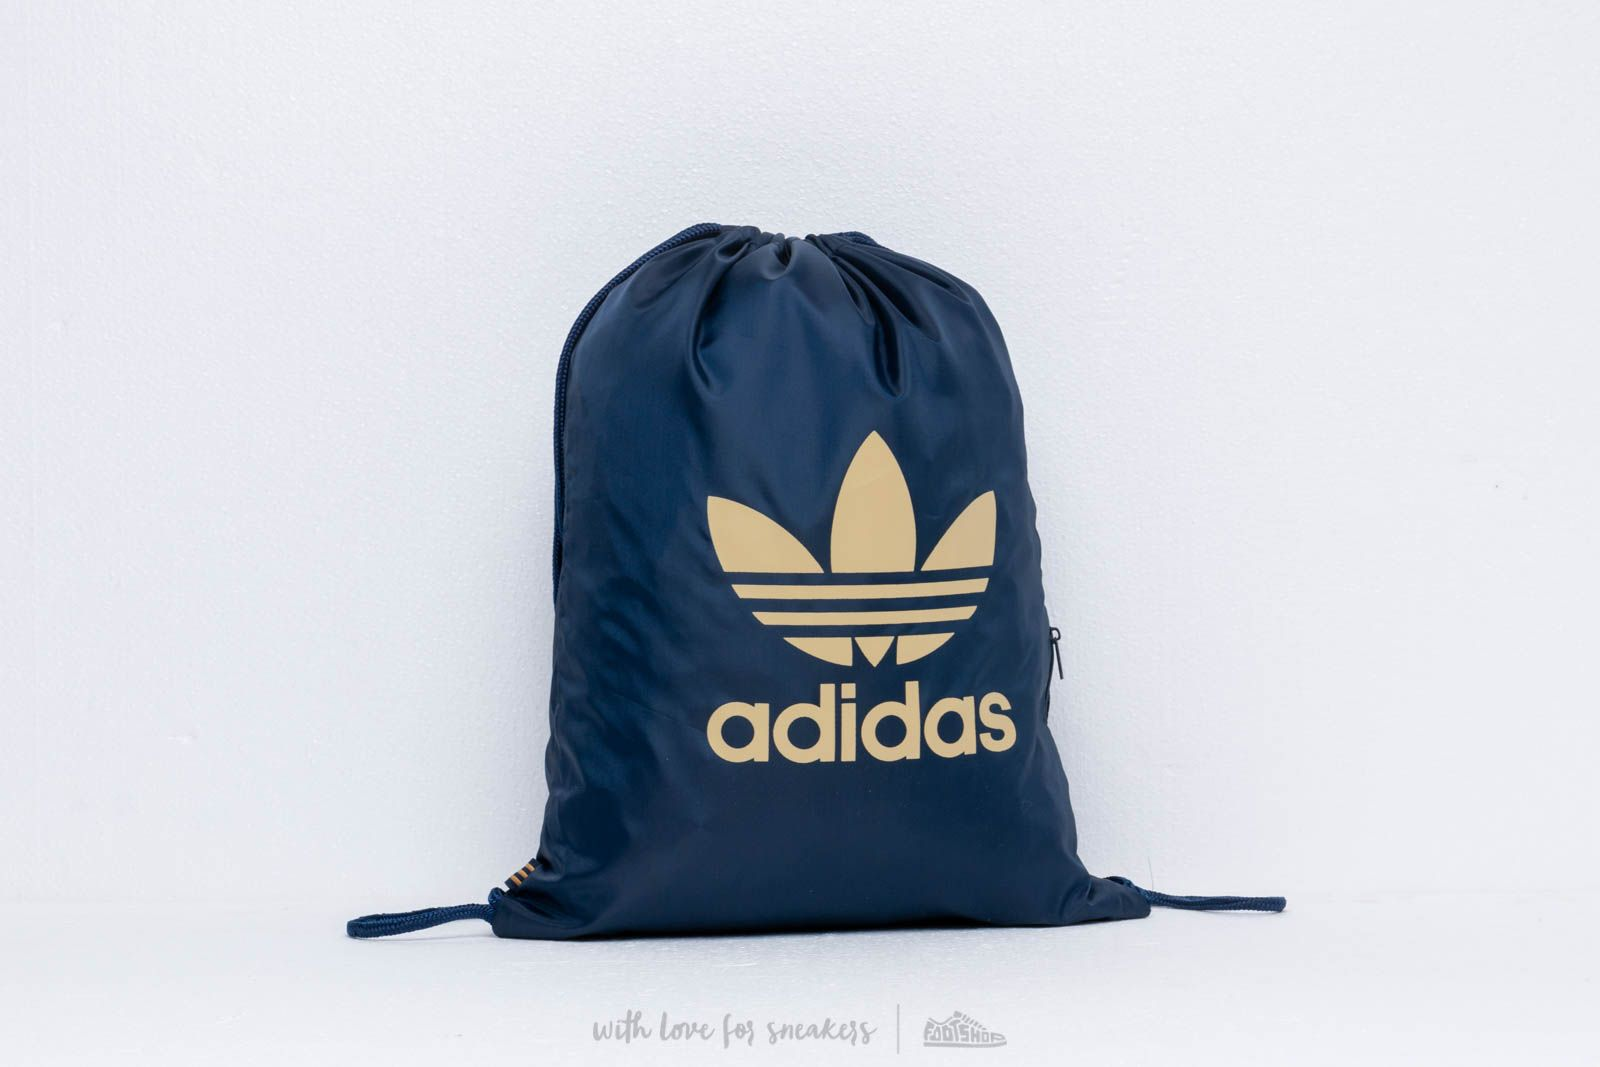 adidas Trefoil Gym Sack Collegiate Navy/ Raw Sand za skvělou cenu 340 Kč koupíte na Footshop.cz